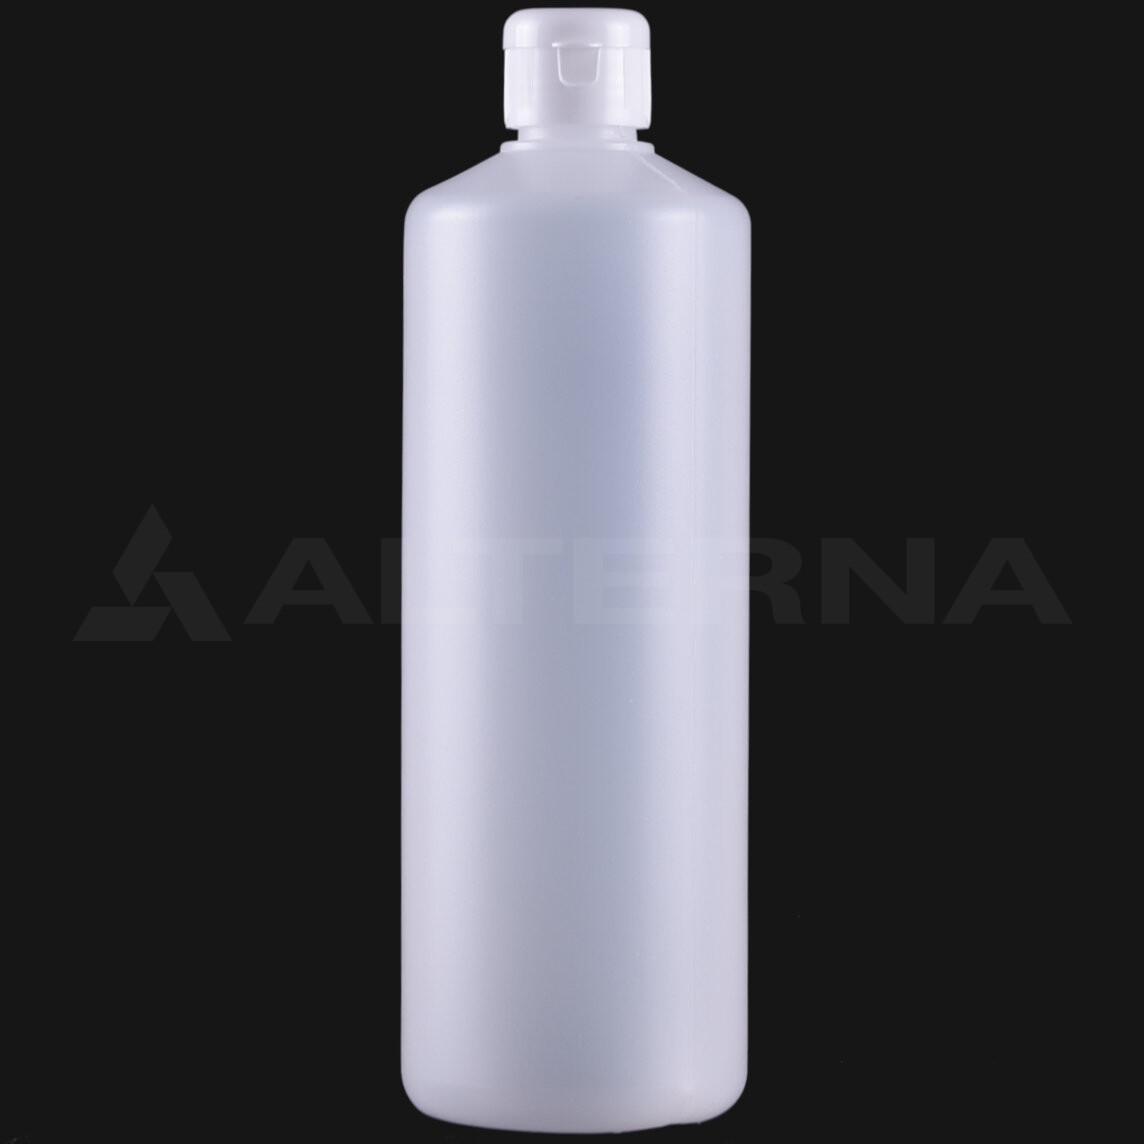 750 ml HDPE Bottle with 28 mm Flip Top Cap